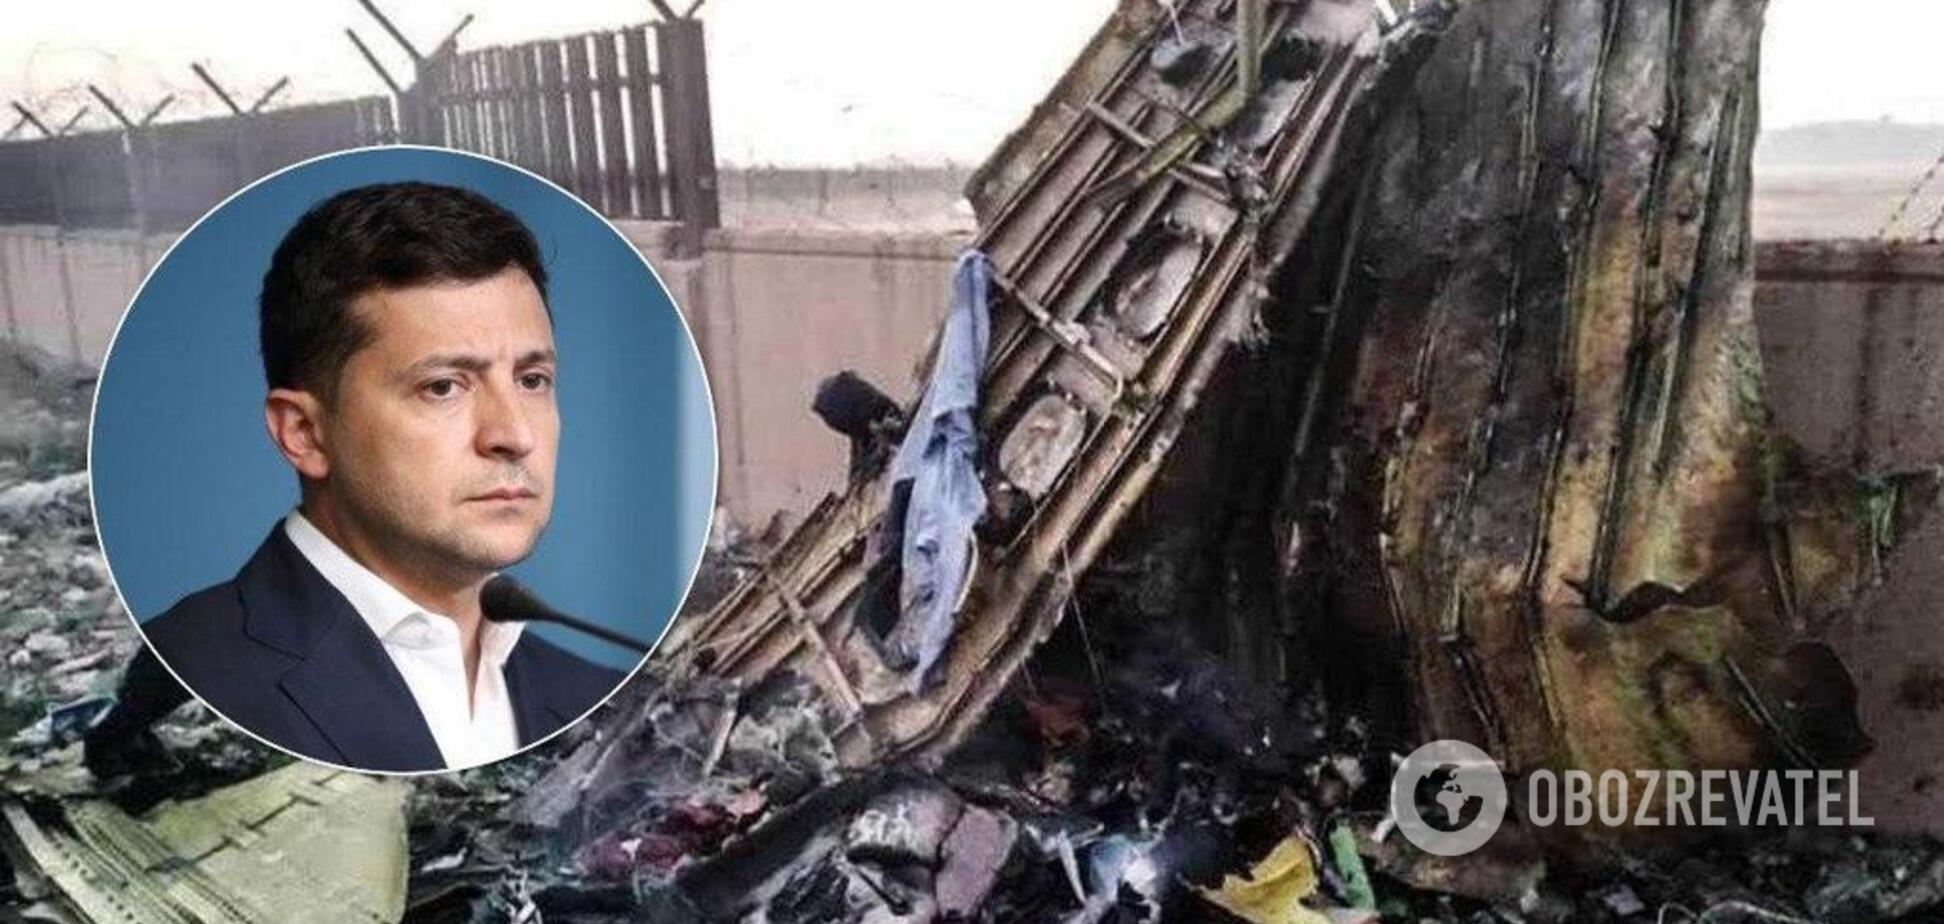 Зеленский дал Рябошапке указания по катастрофе самолета МАУ